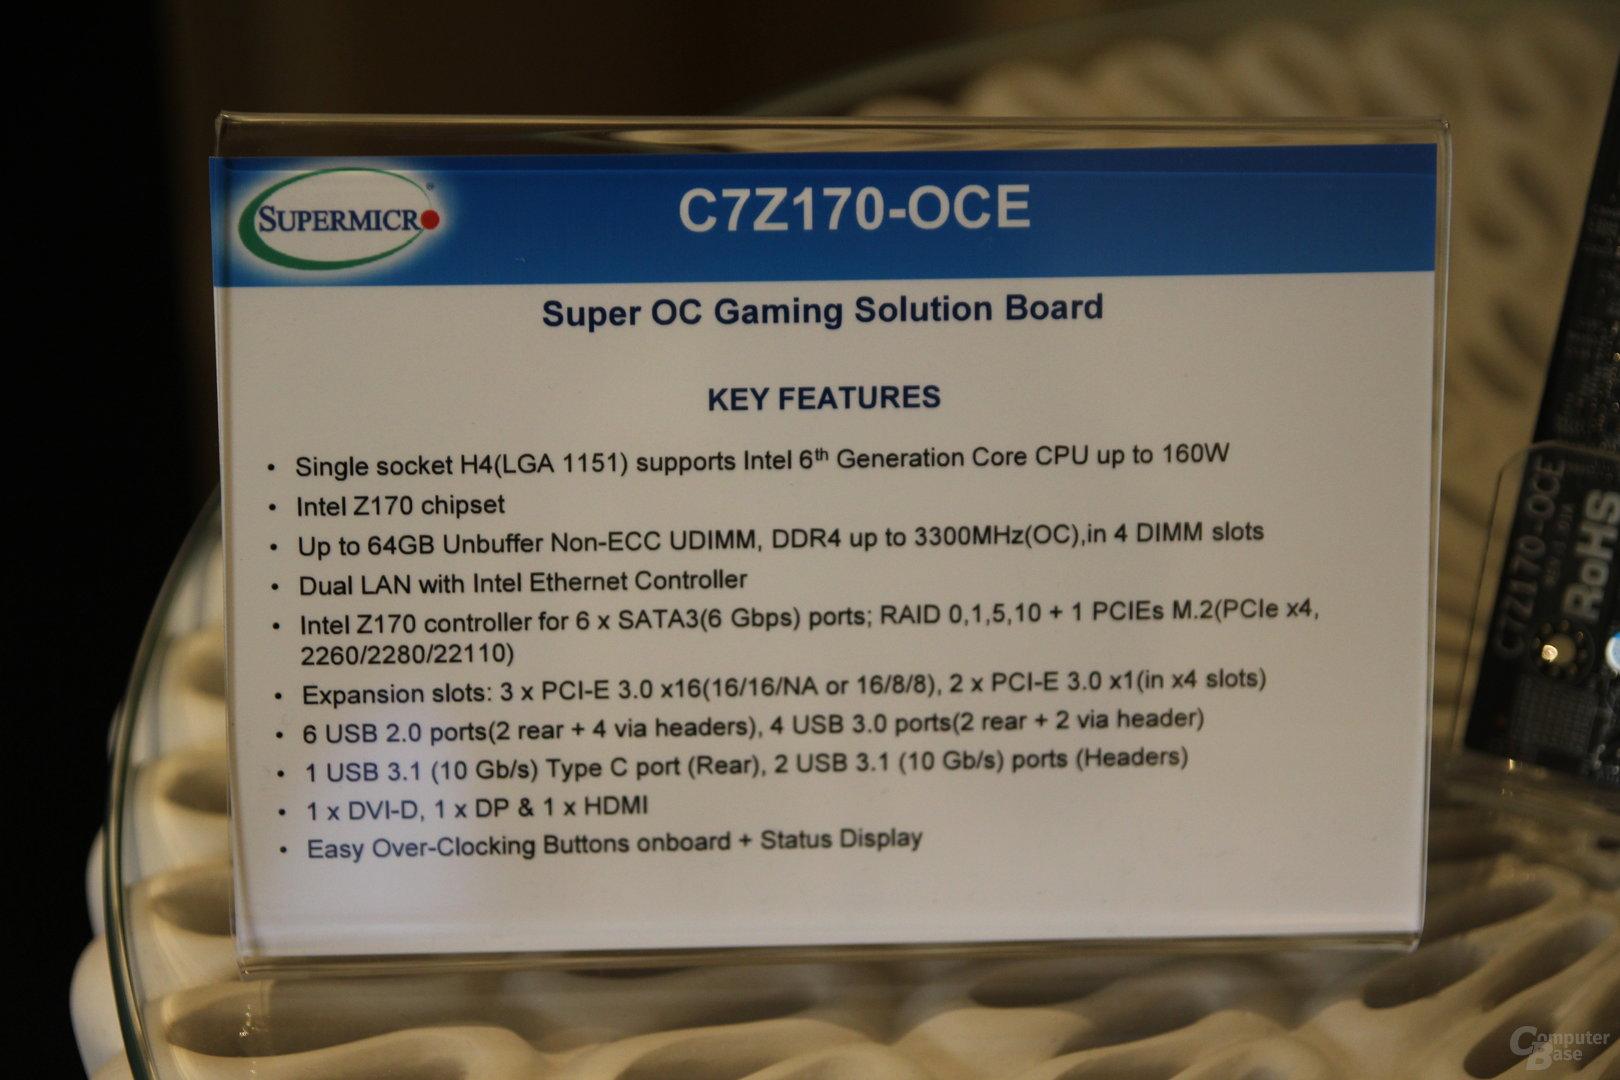 Supermicro C7Z170-OCE